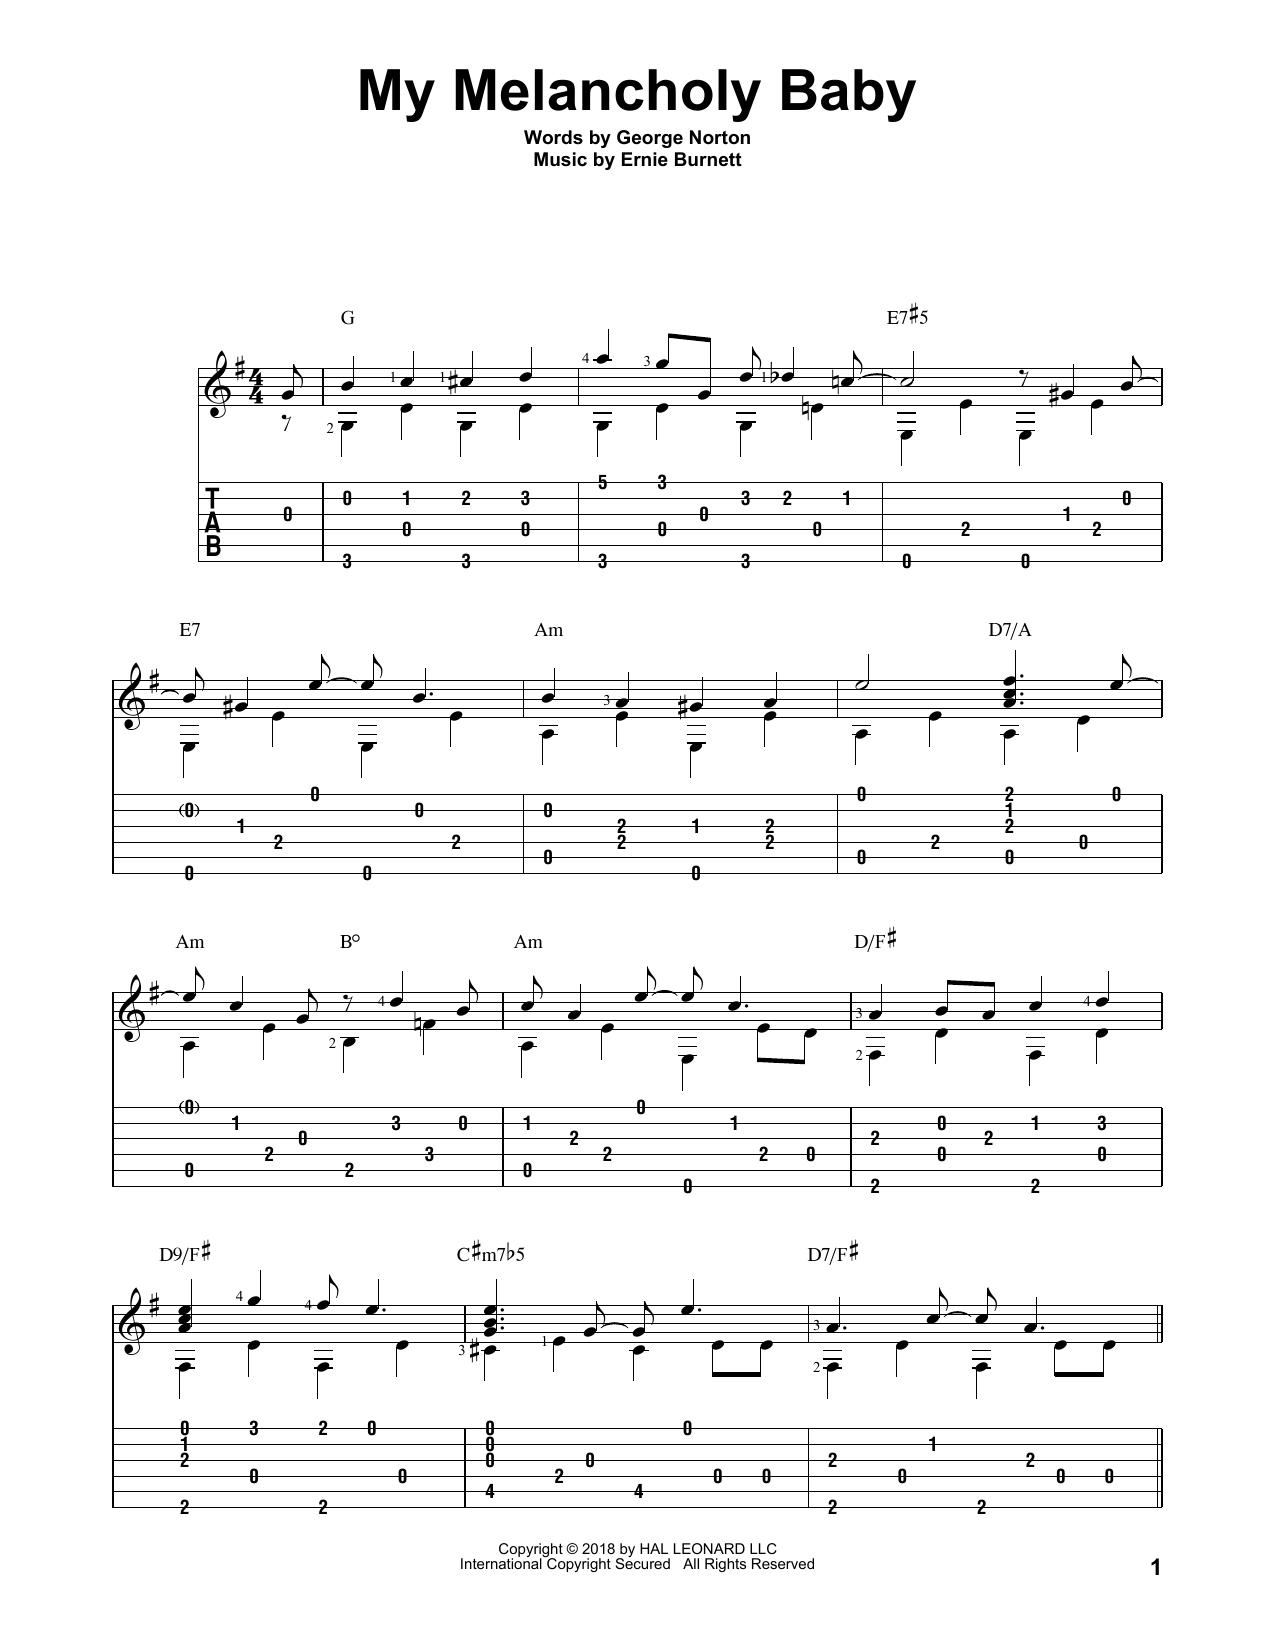 Ernie Burnett 'My Melancholy Baby' Sheet Music Notes, Chords | Download  Printable Solo Guitar - SKU: 403908